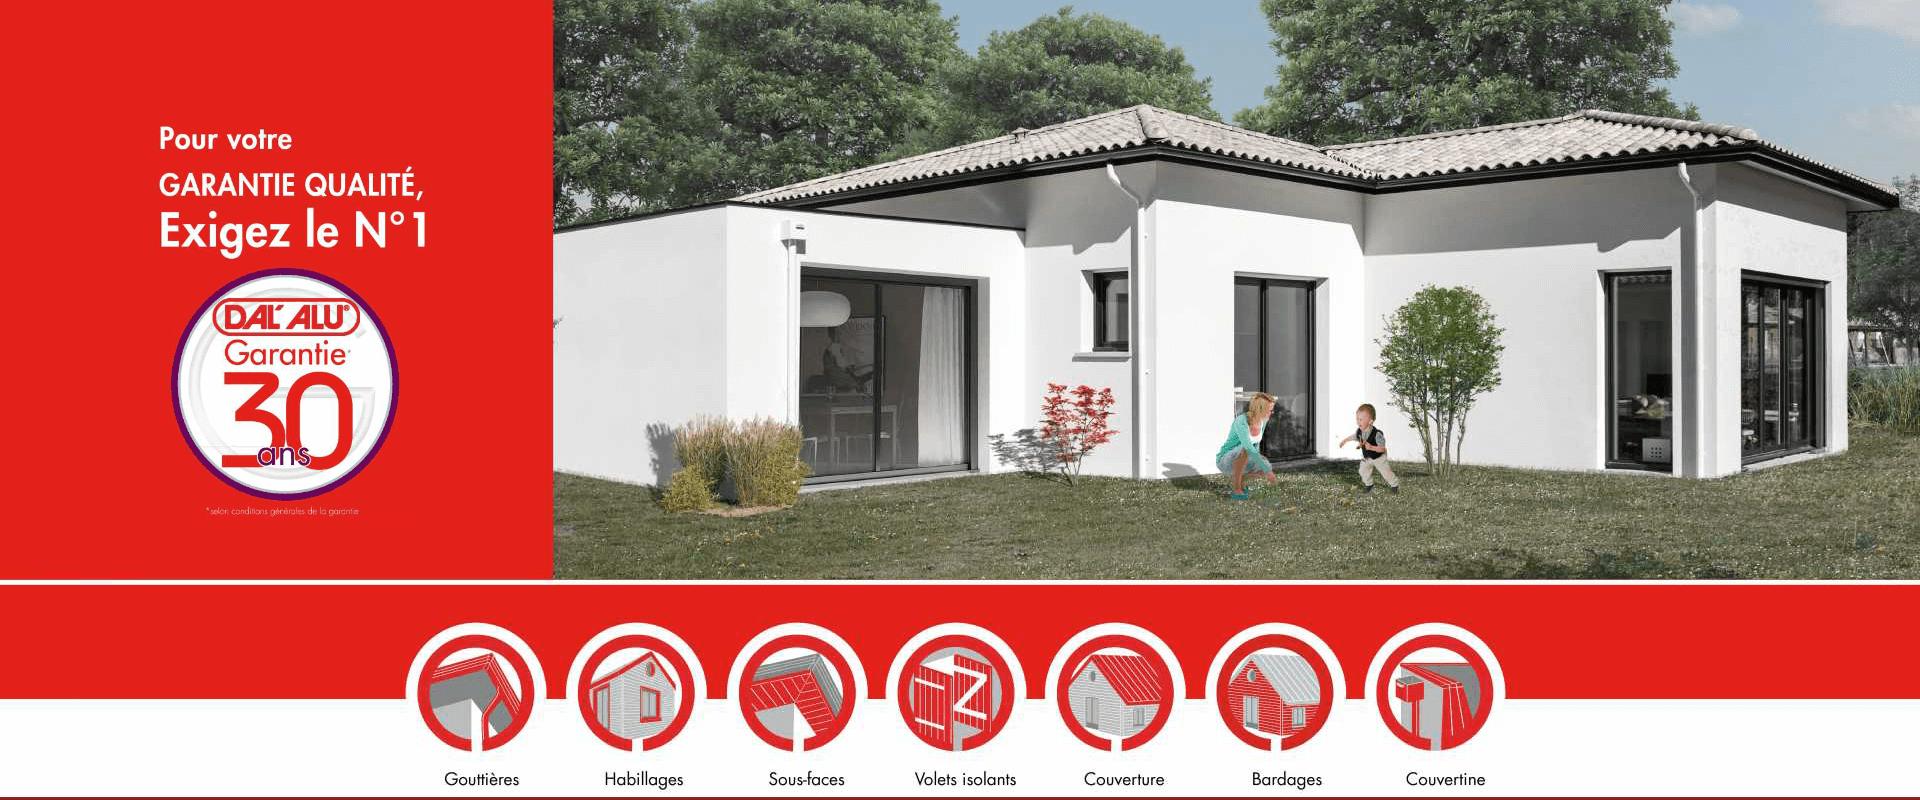 renovation toiture lyon bjbat dal 39 alu contactez nous 04 72 31 61 49. Black Bedroom Furniture Sets. Home Design Ideas